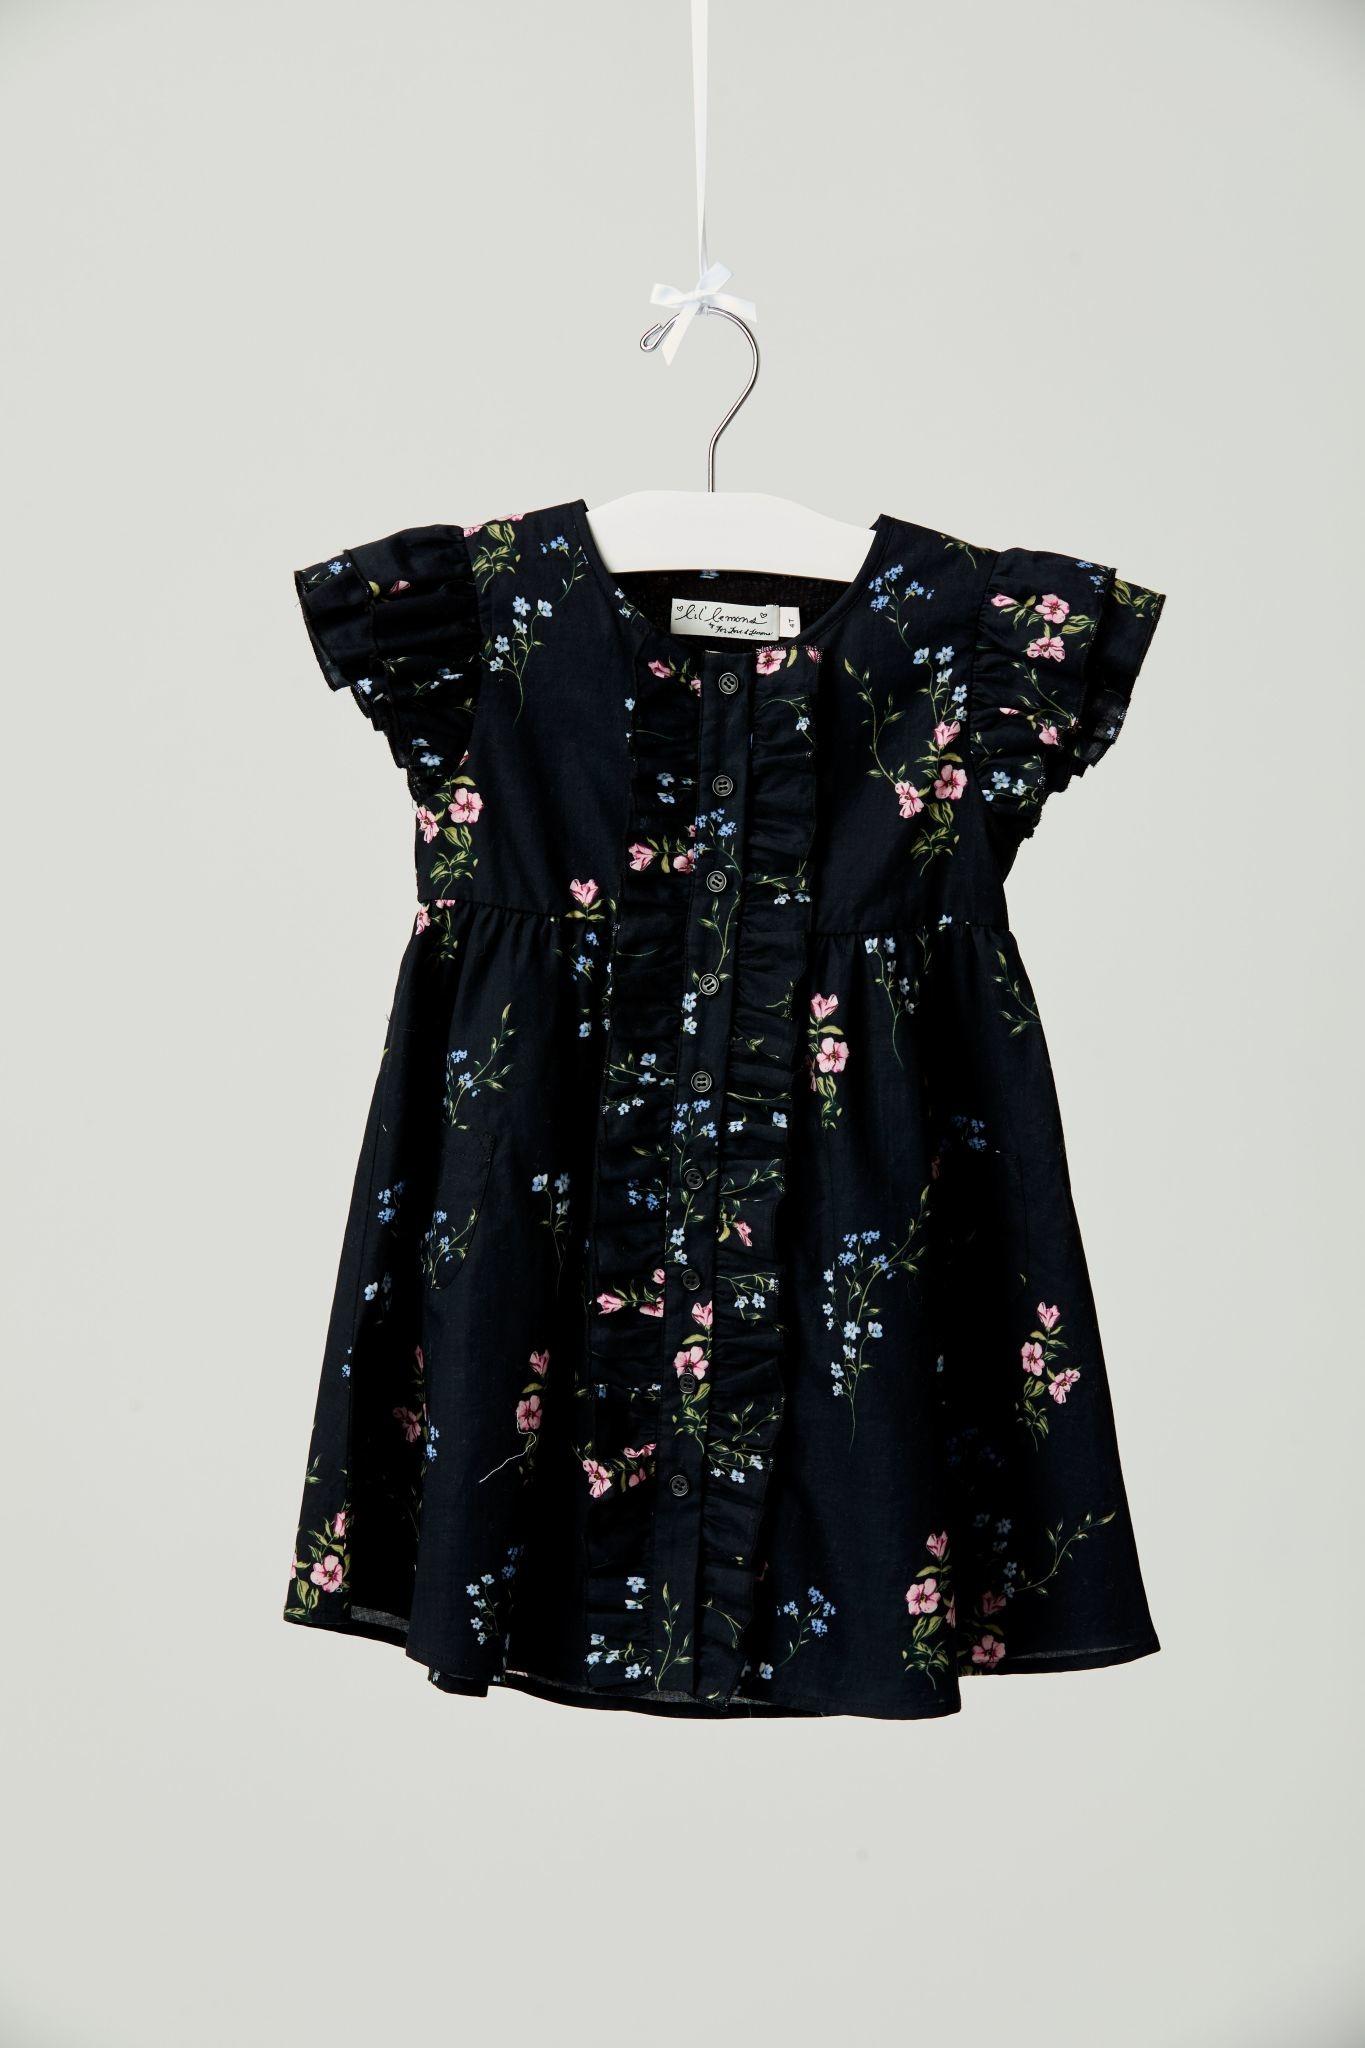 LIL' LEMONS Flower Patch Ruffle Dress